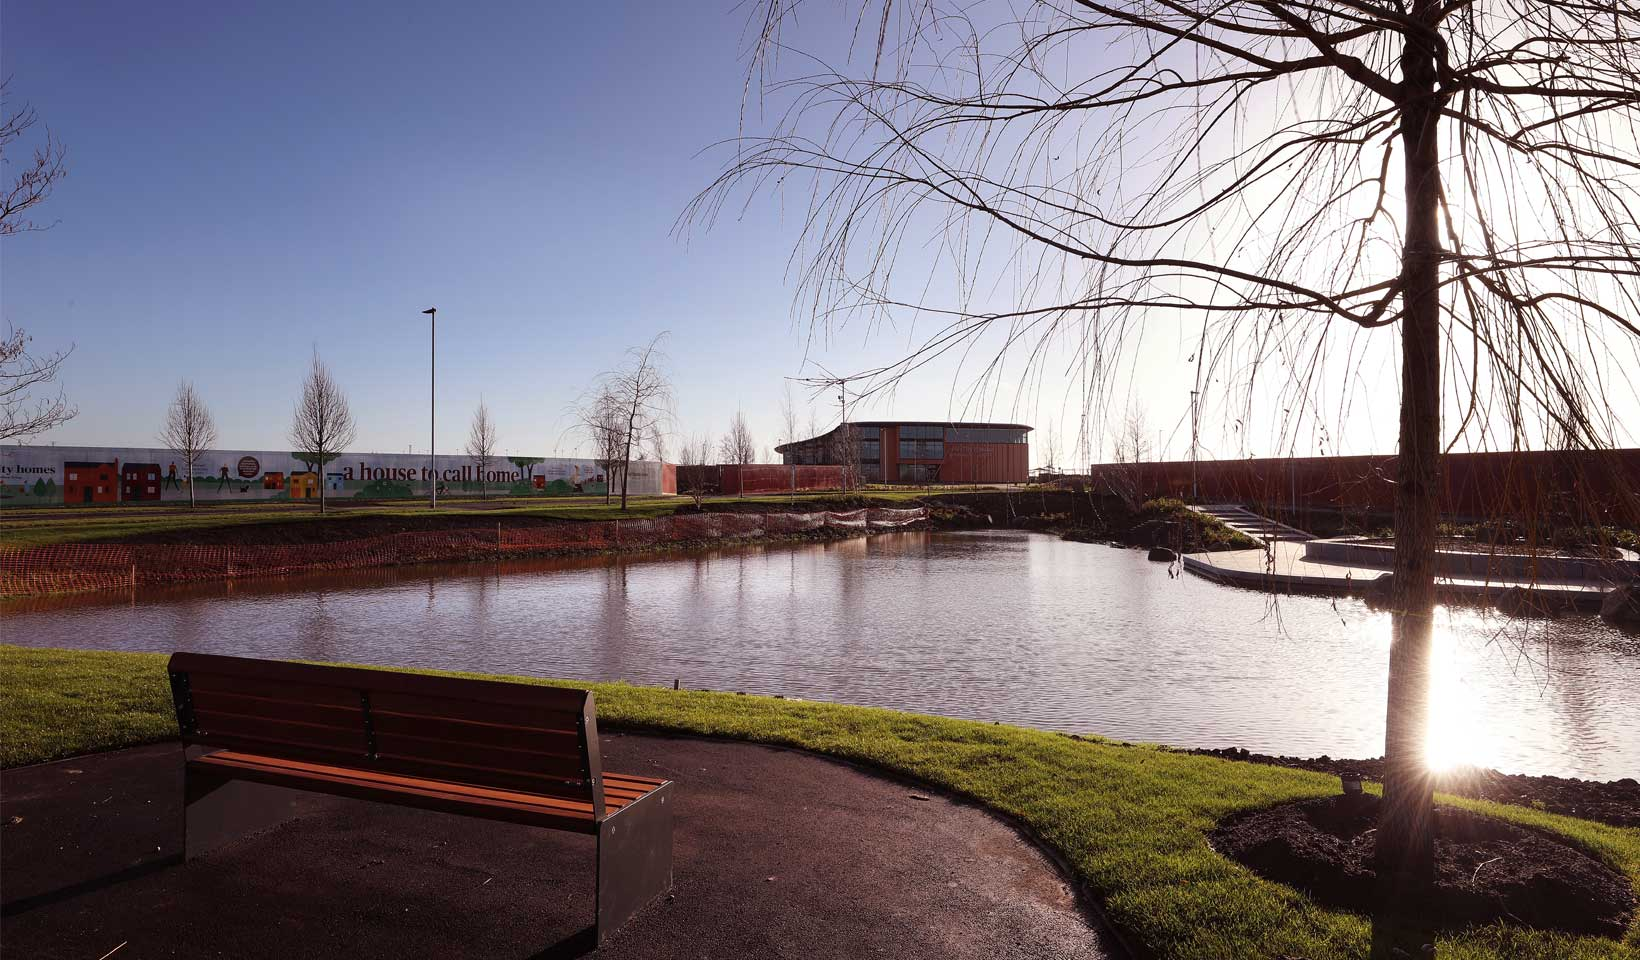 Facilities at Wintringham